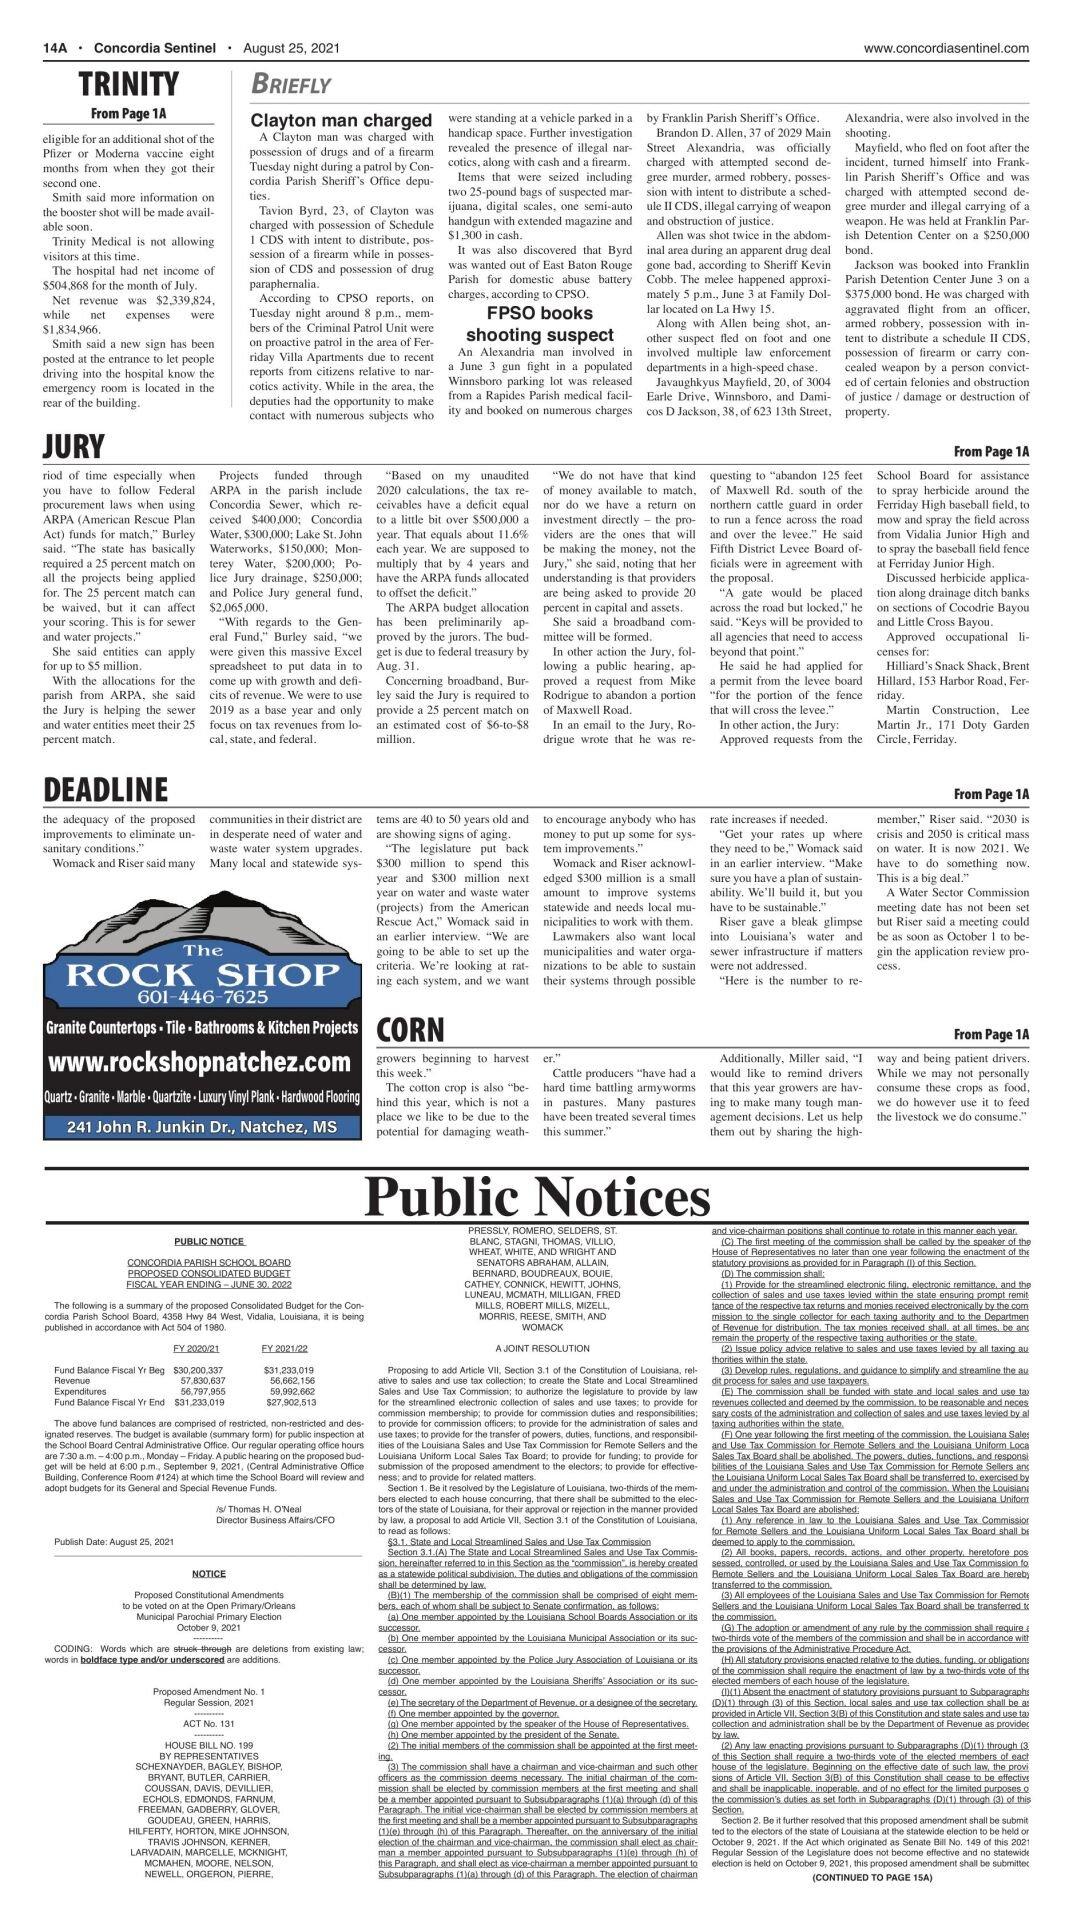 Public Notices - August 25, 2021